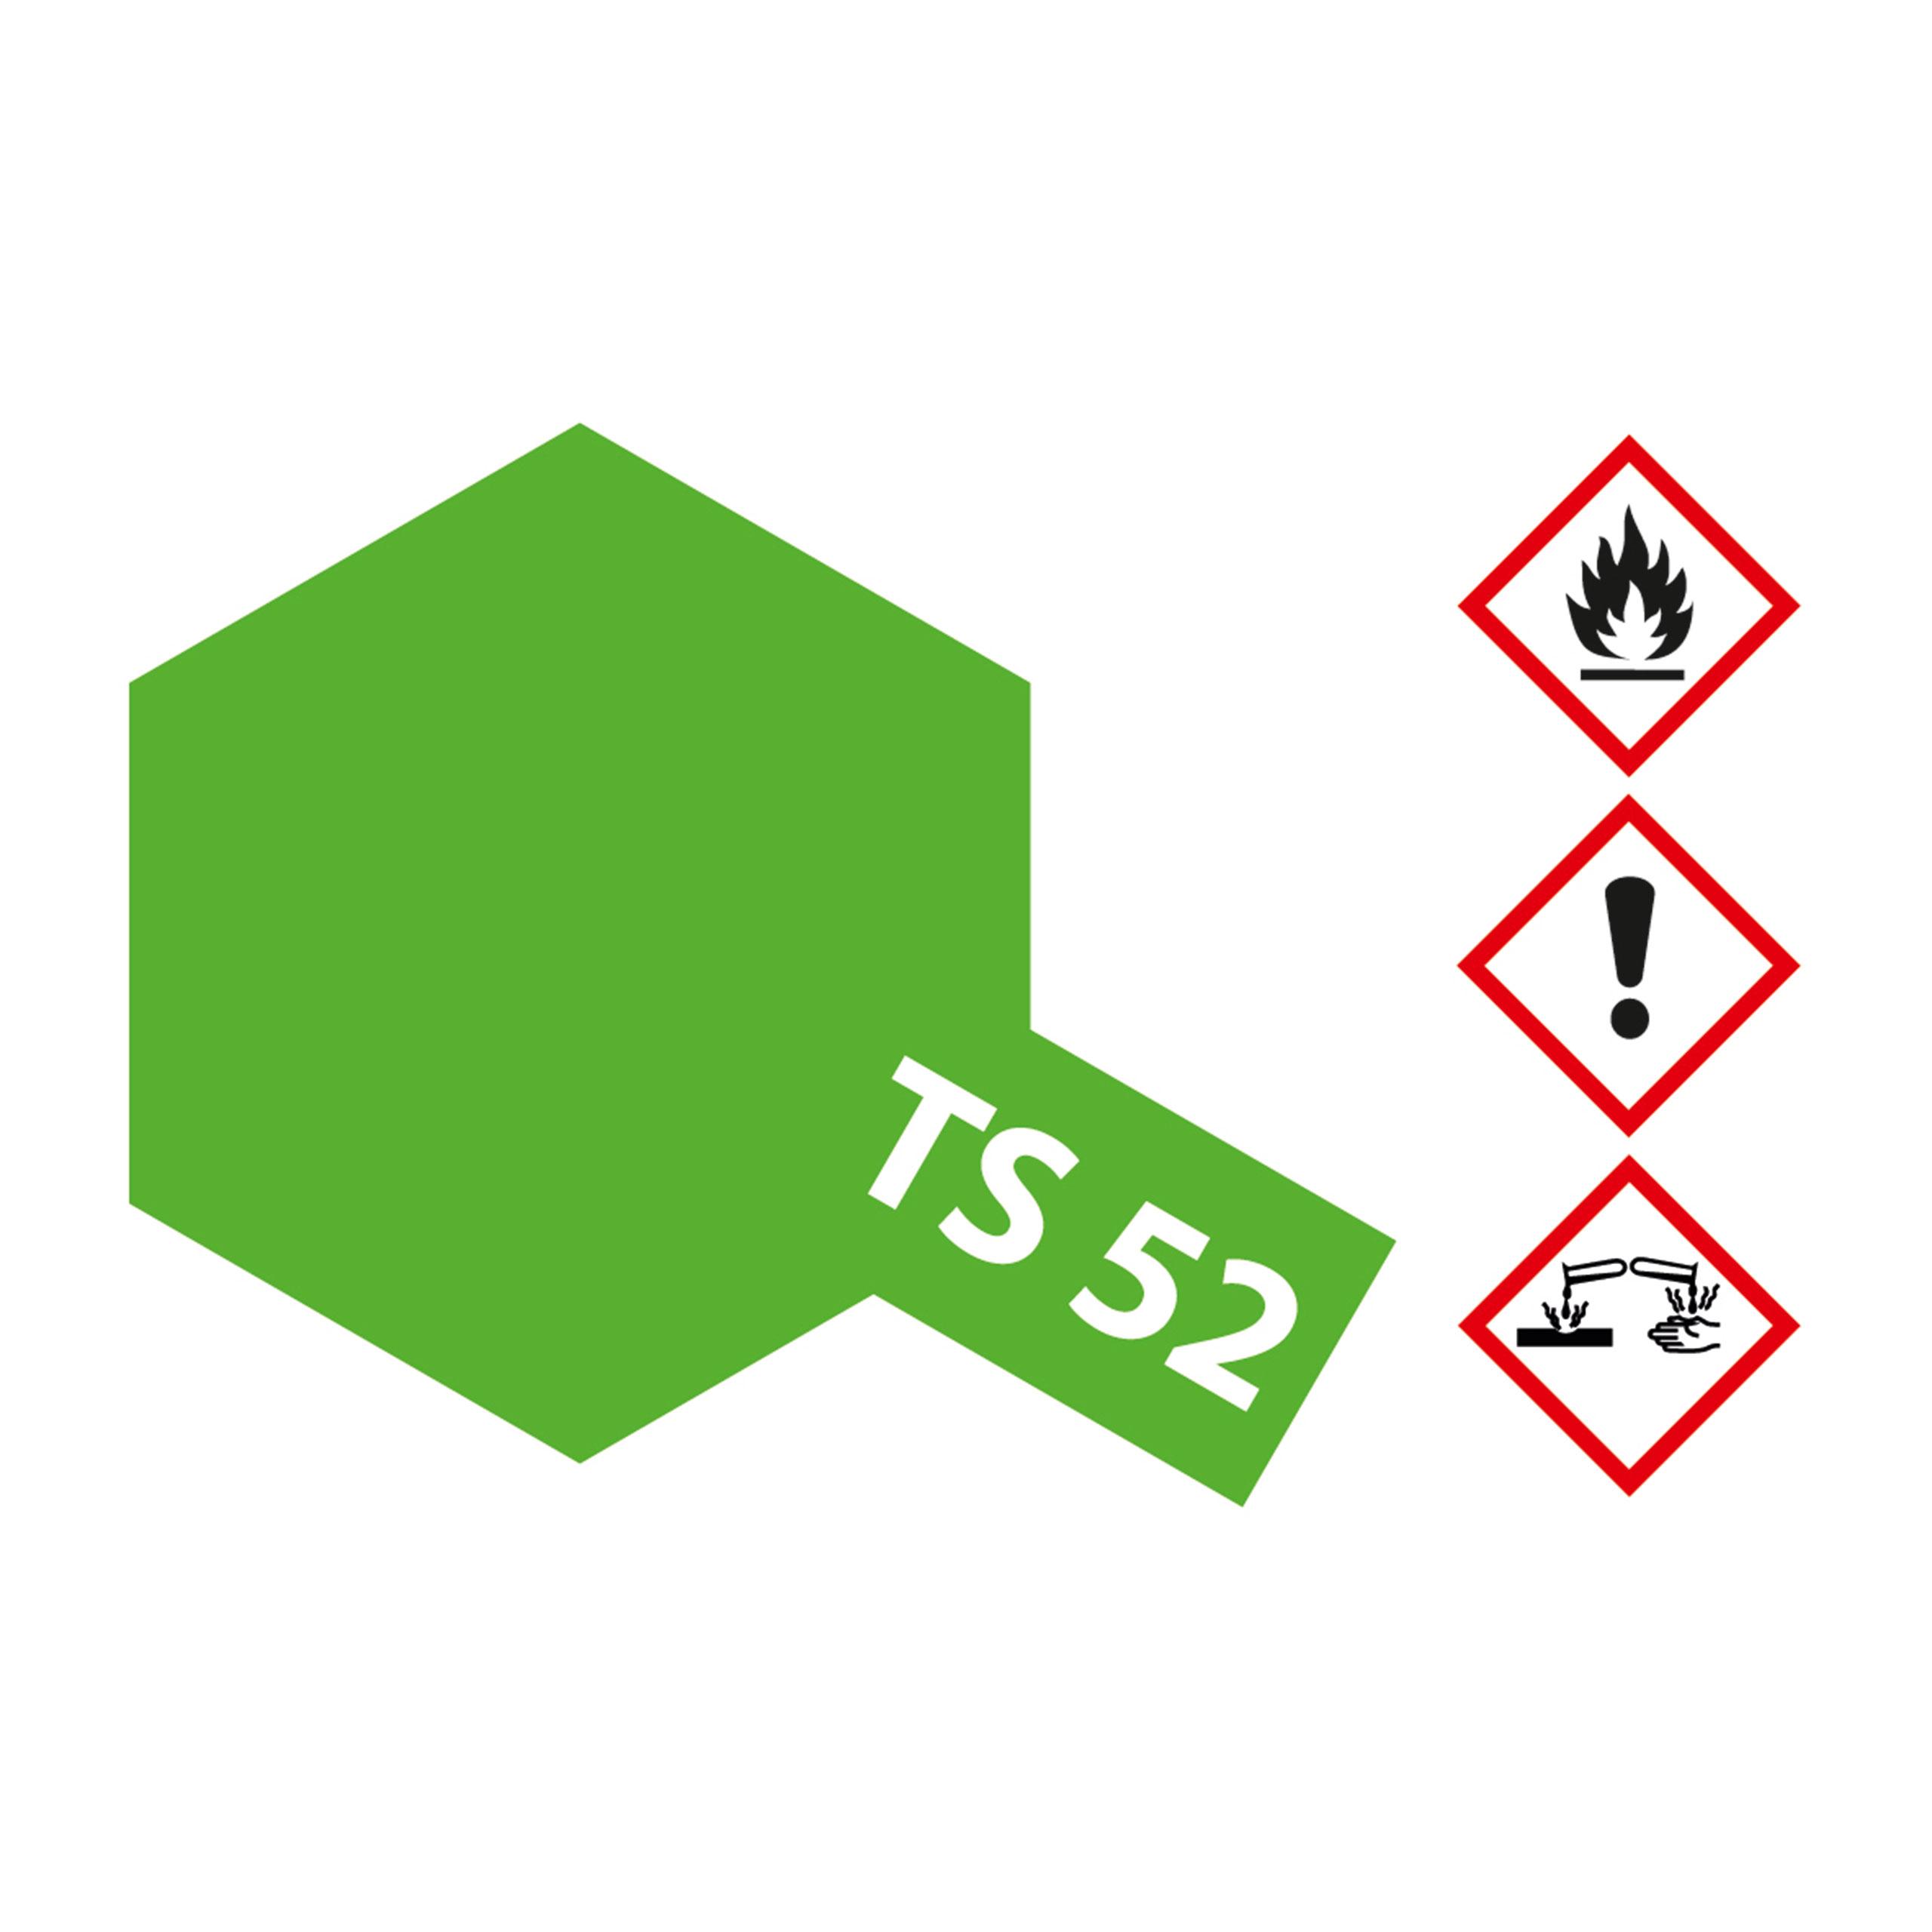 TS-52 Bonbon-Limet Grün(Candy) gl. - 100ml Sprayfarbe Kunstharz Tamiya 300085052